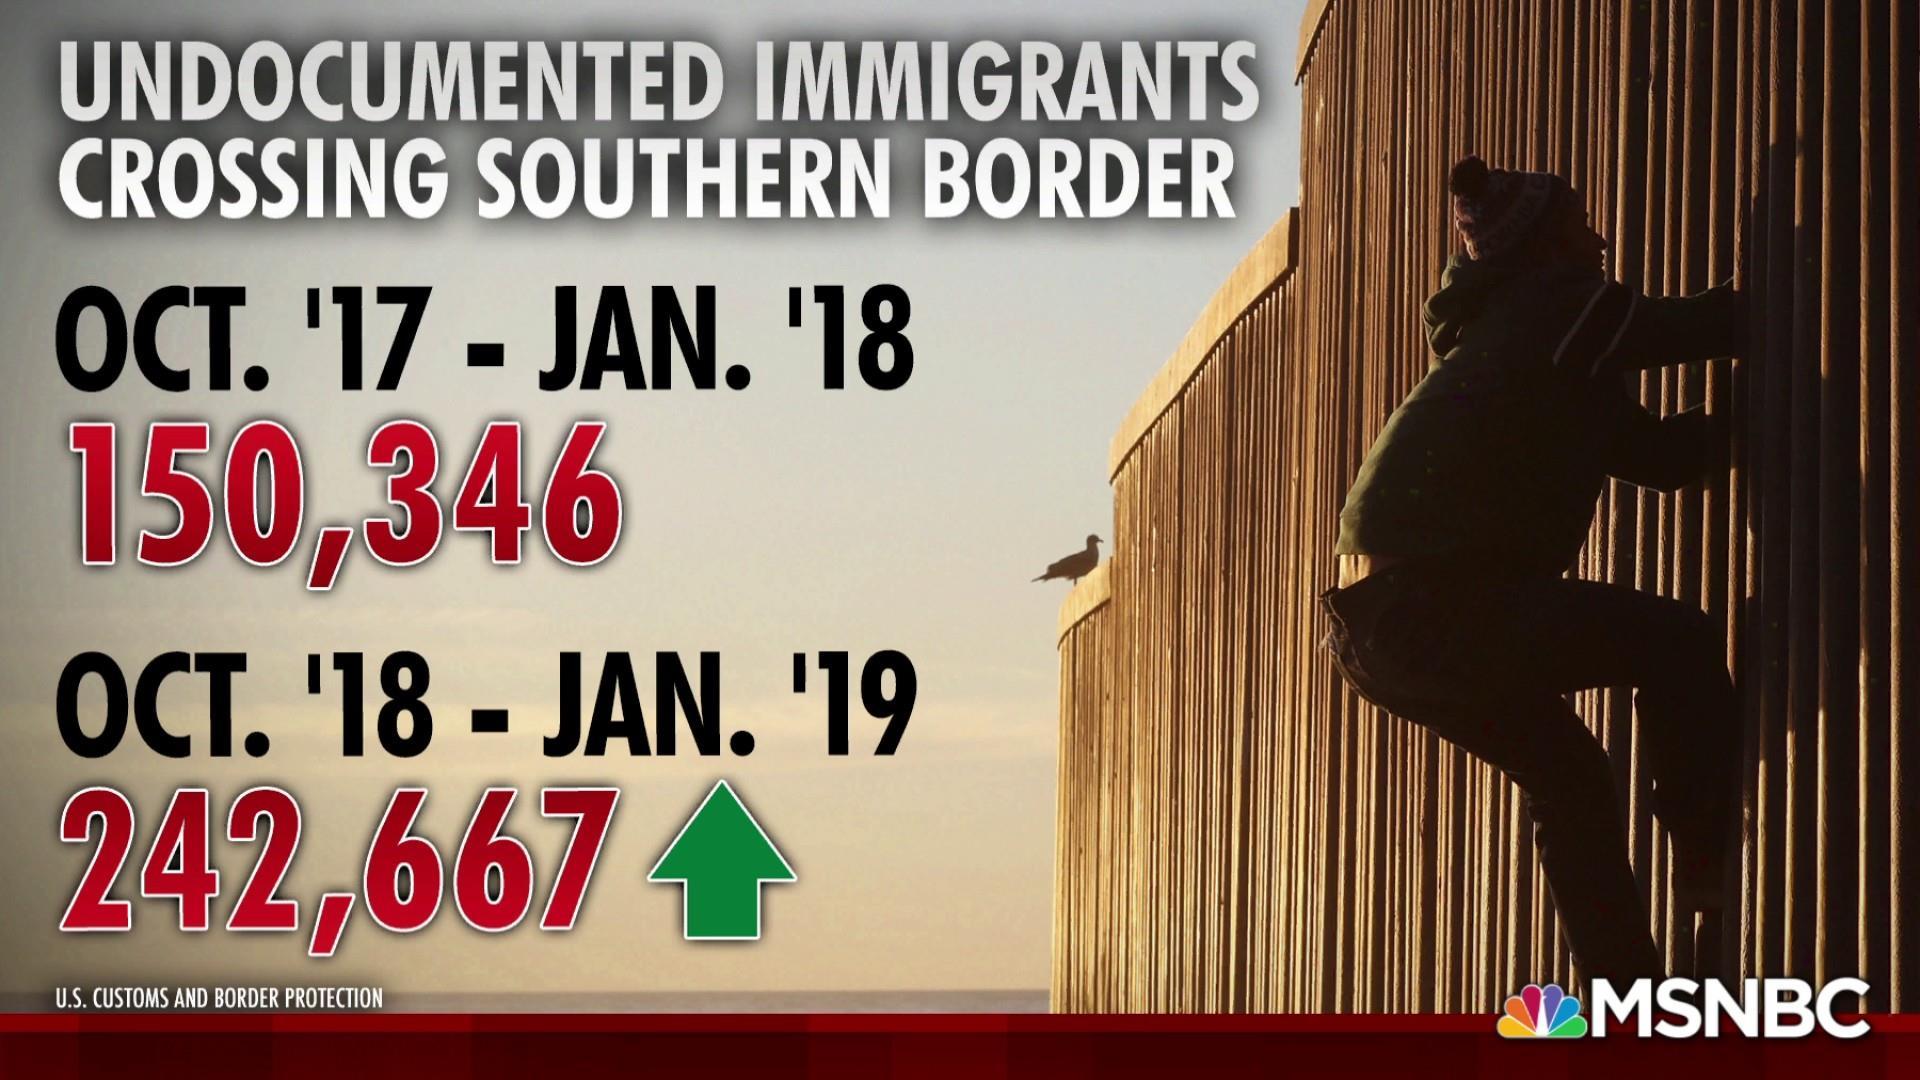 Trump policies causing surge of illegal border crossings